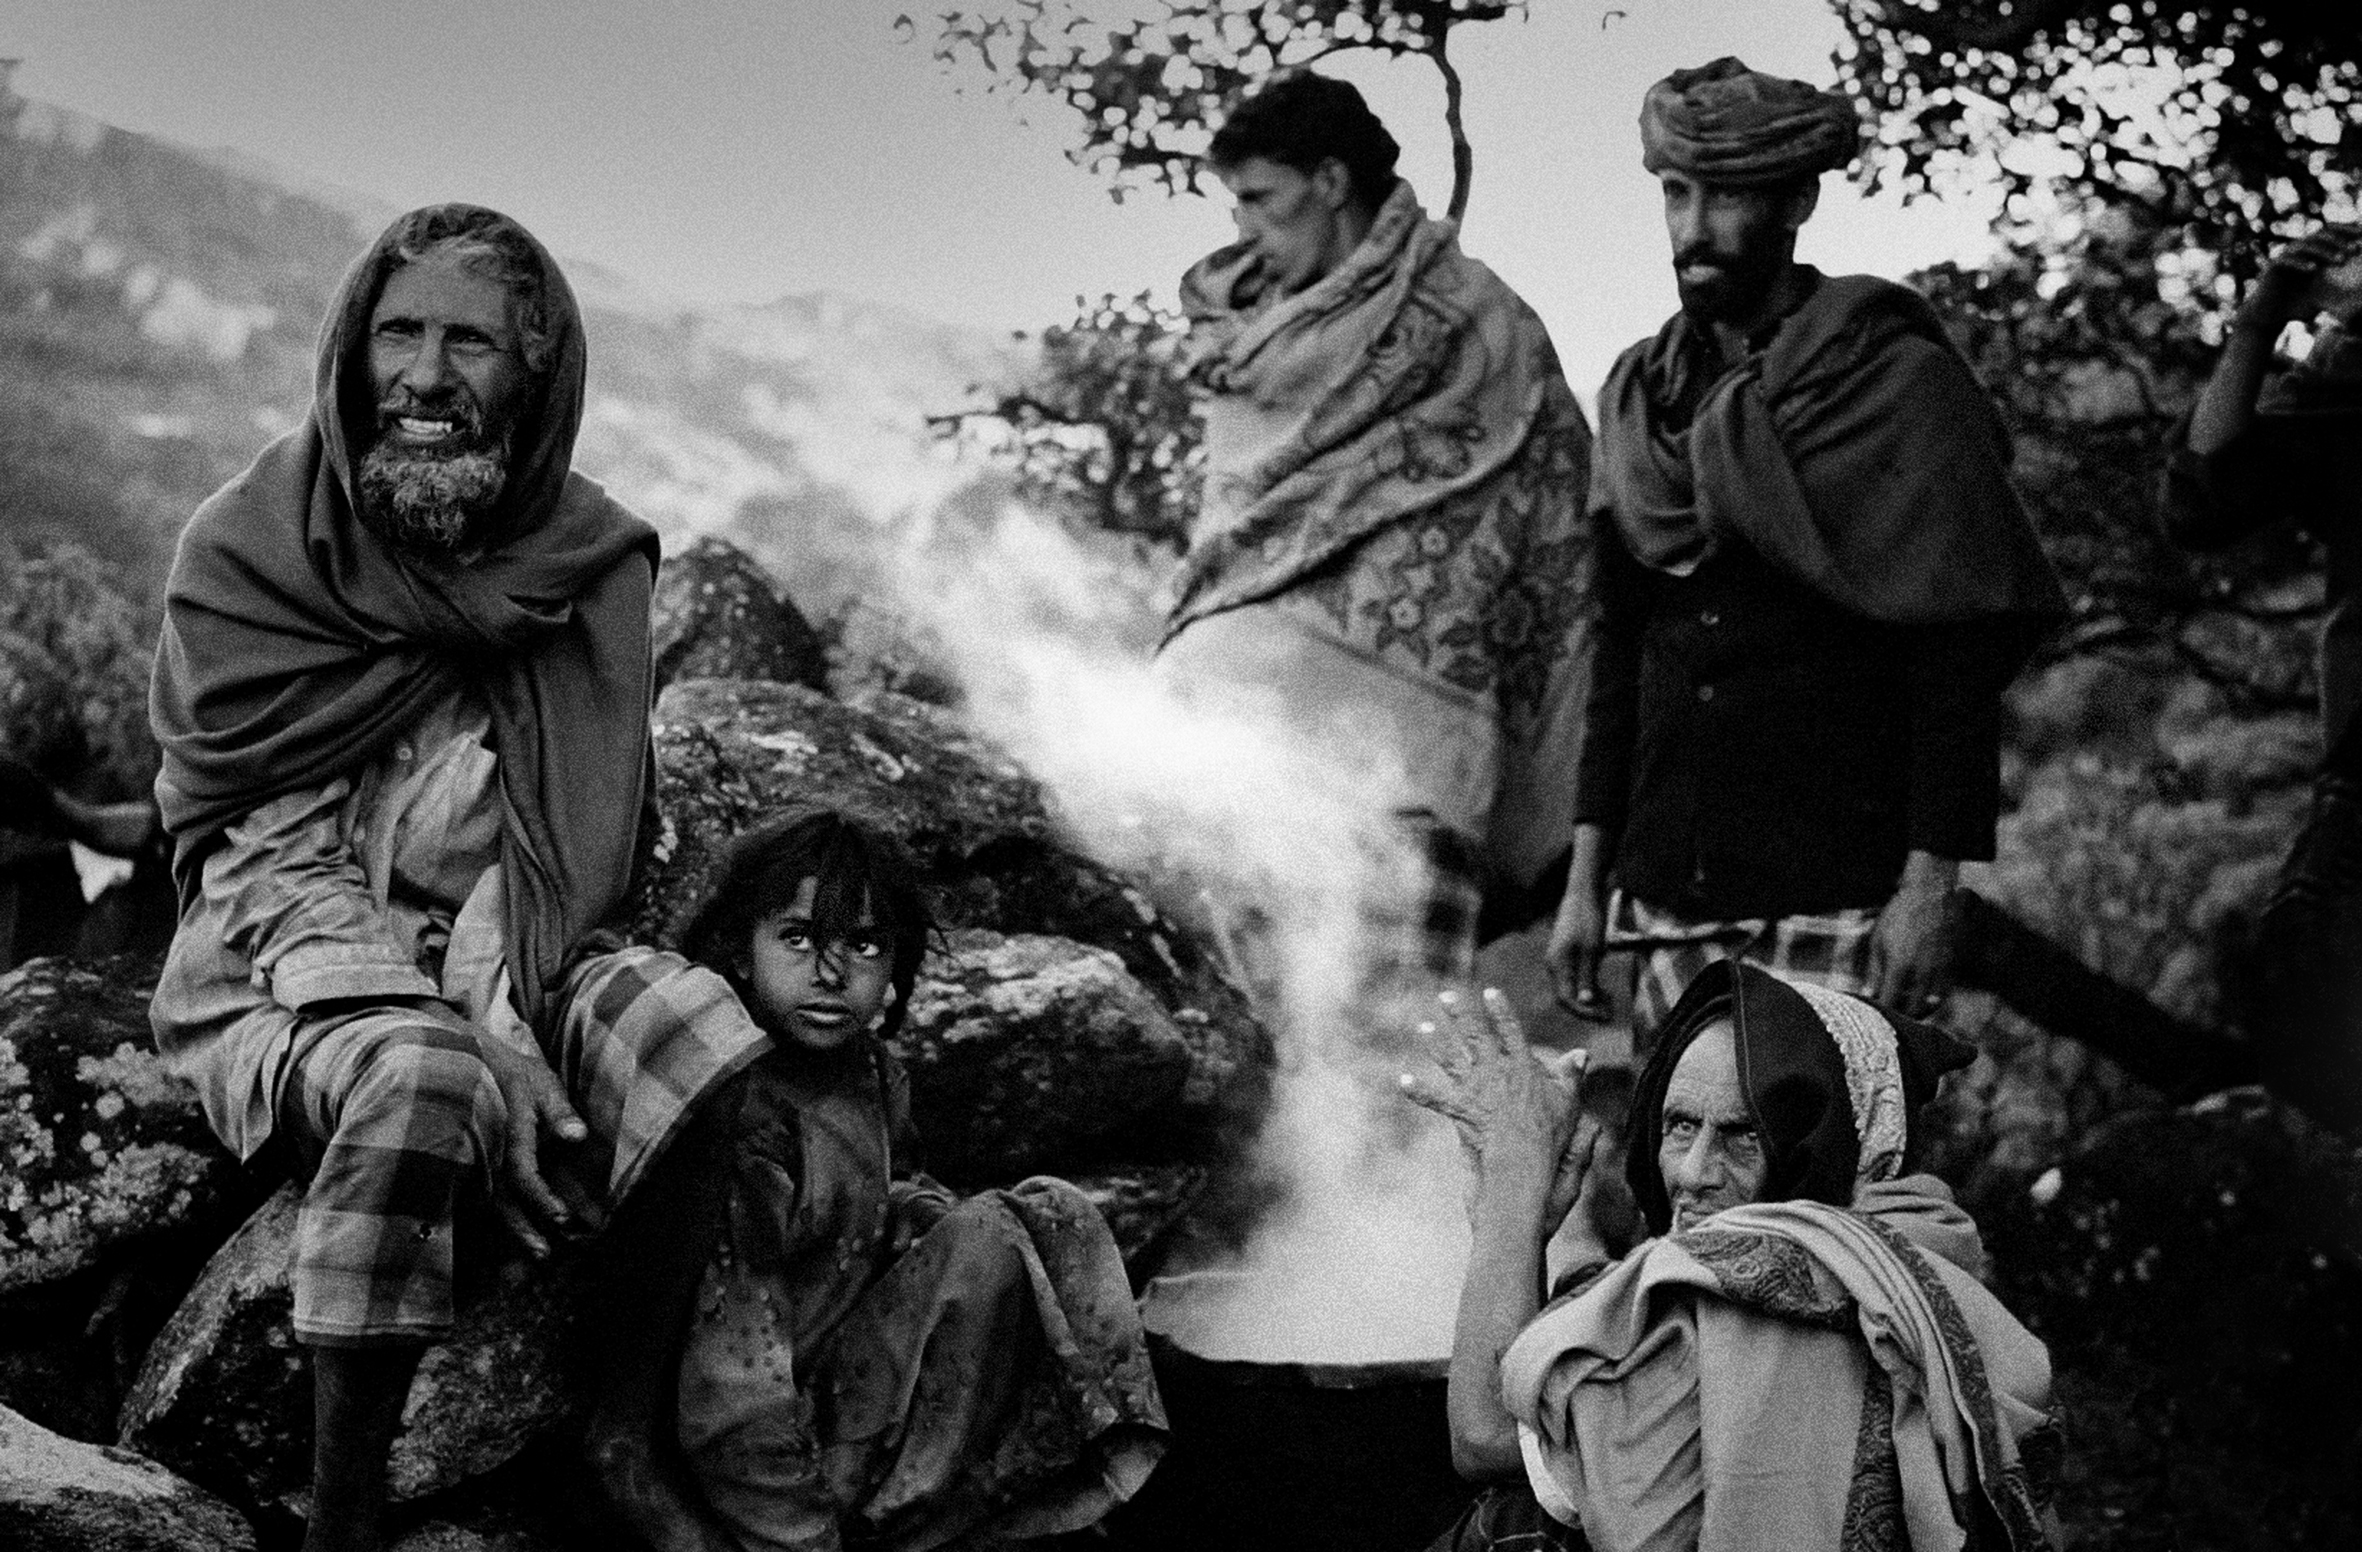 Socotra, The Island of Djinns ,Jordi Esteva (2014)